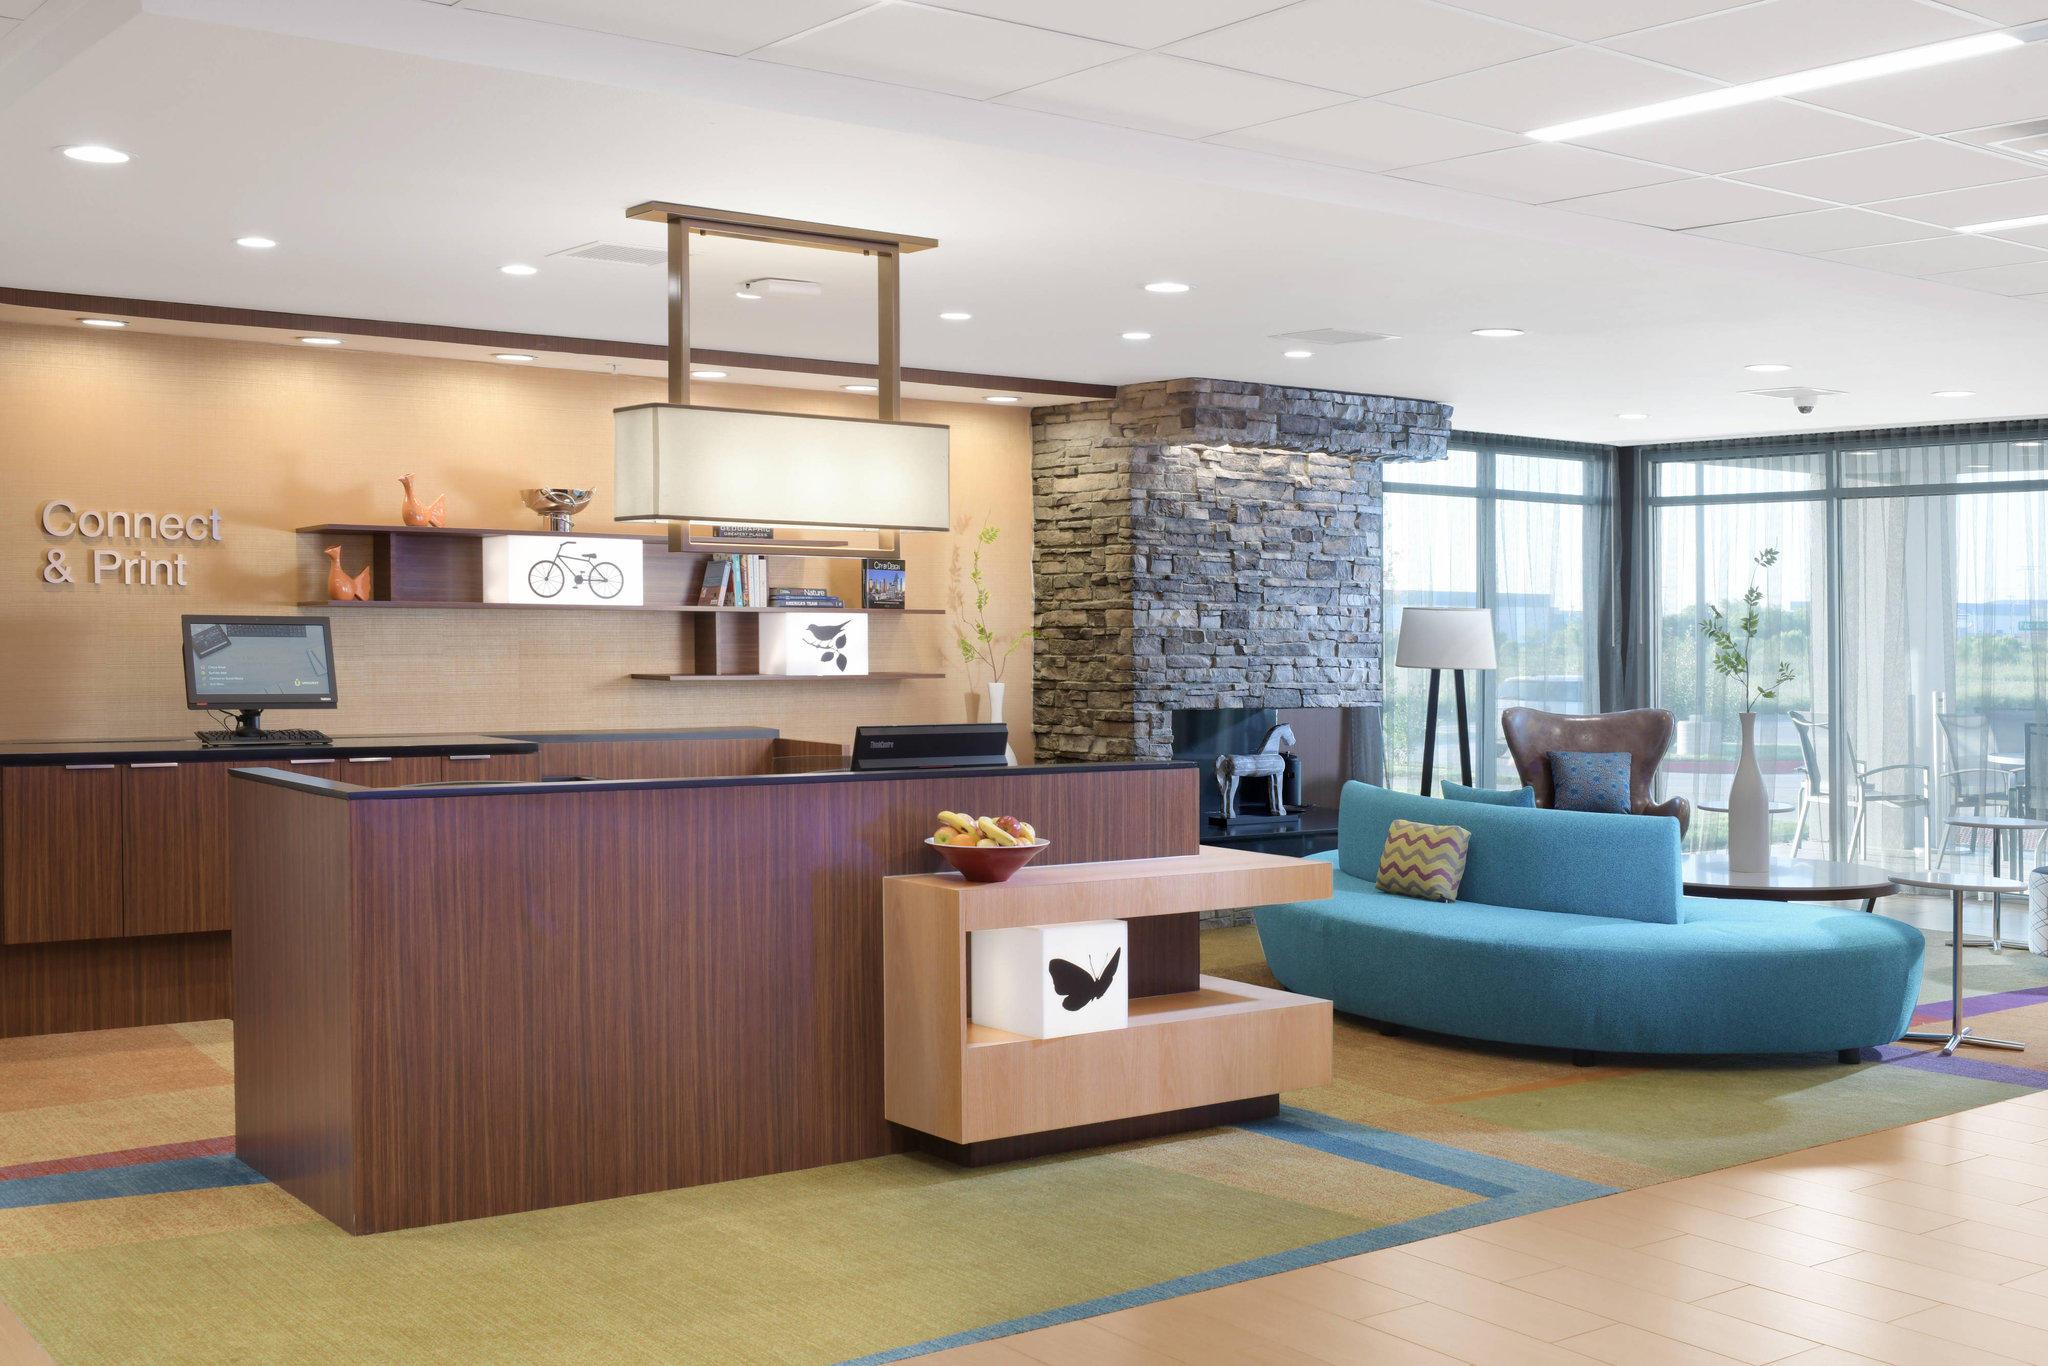 Fairfield Inn & Suites by Marriott Fort Worth South/Burleson